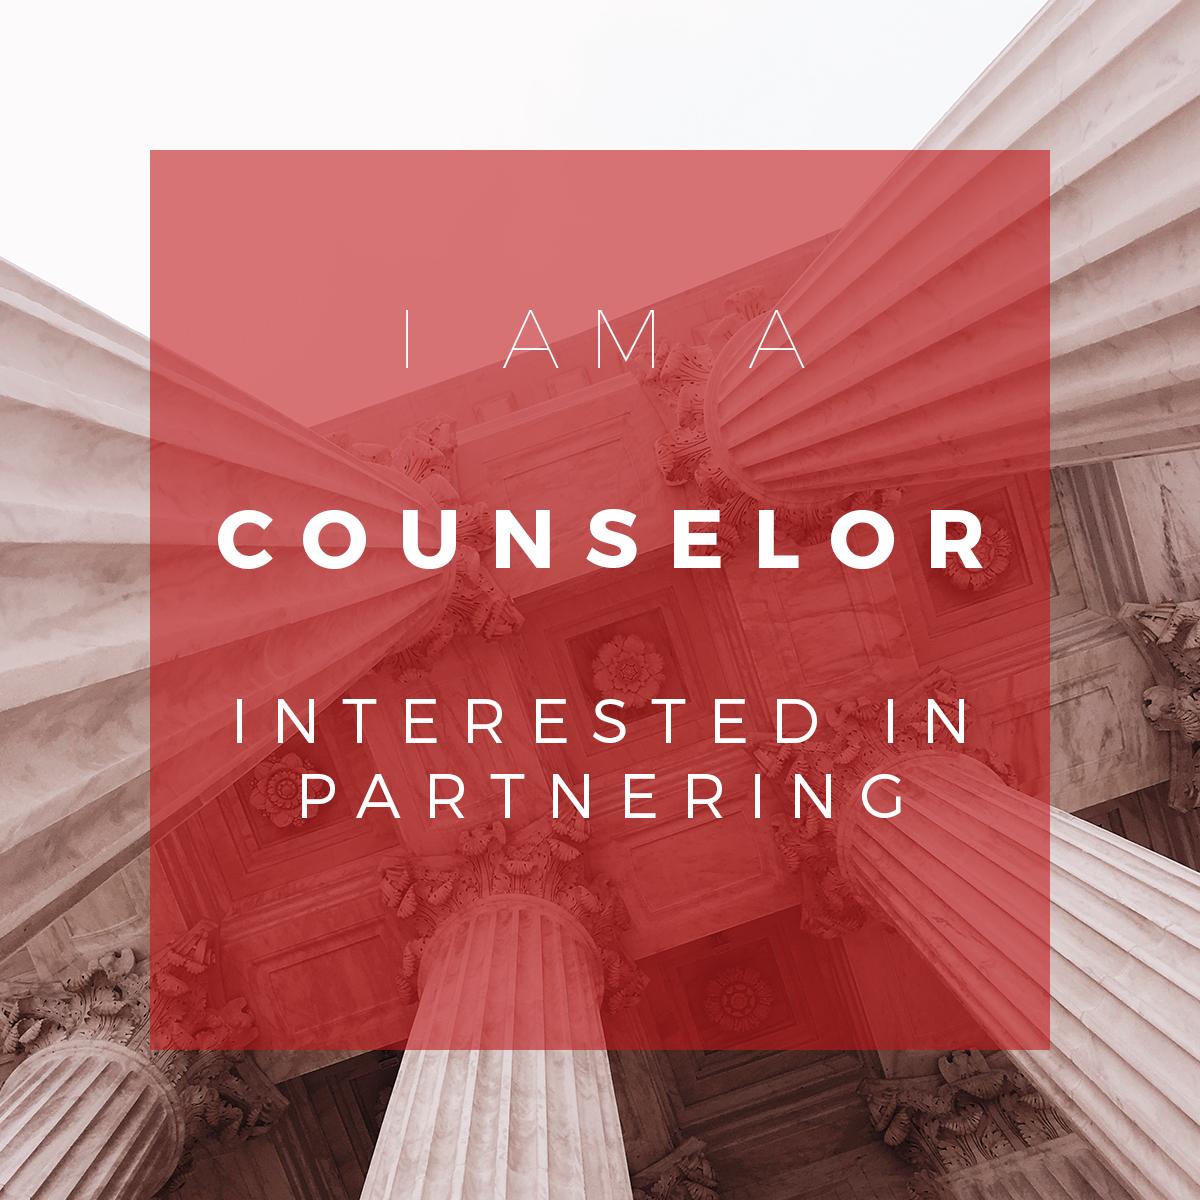 I-Am-A-Counselor2.jpg